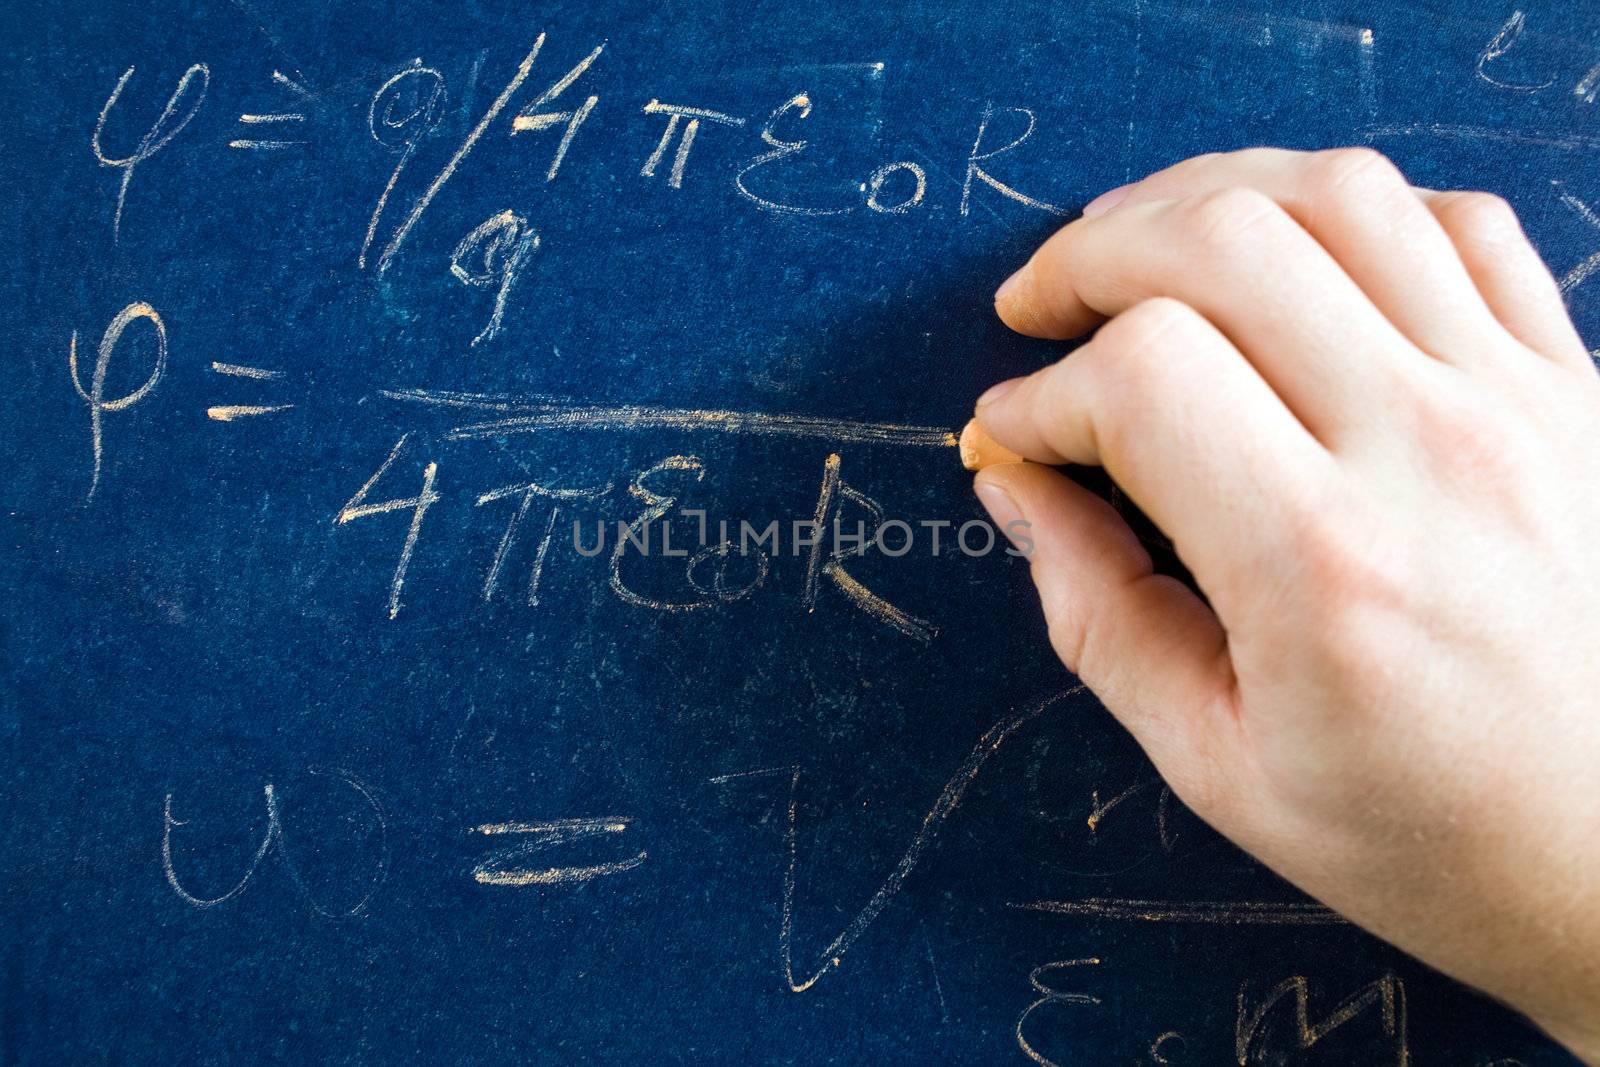 Stock photo: an image of a hand writing formula on a blackboard